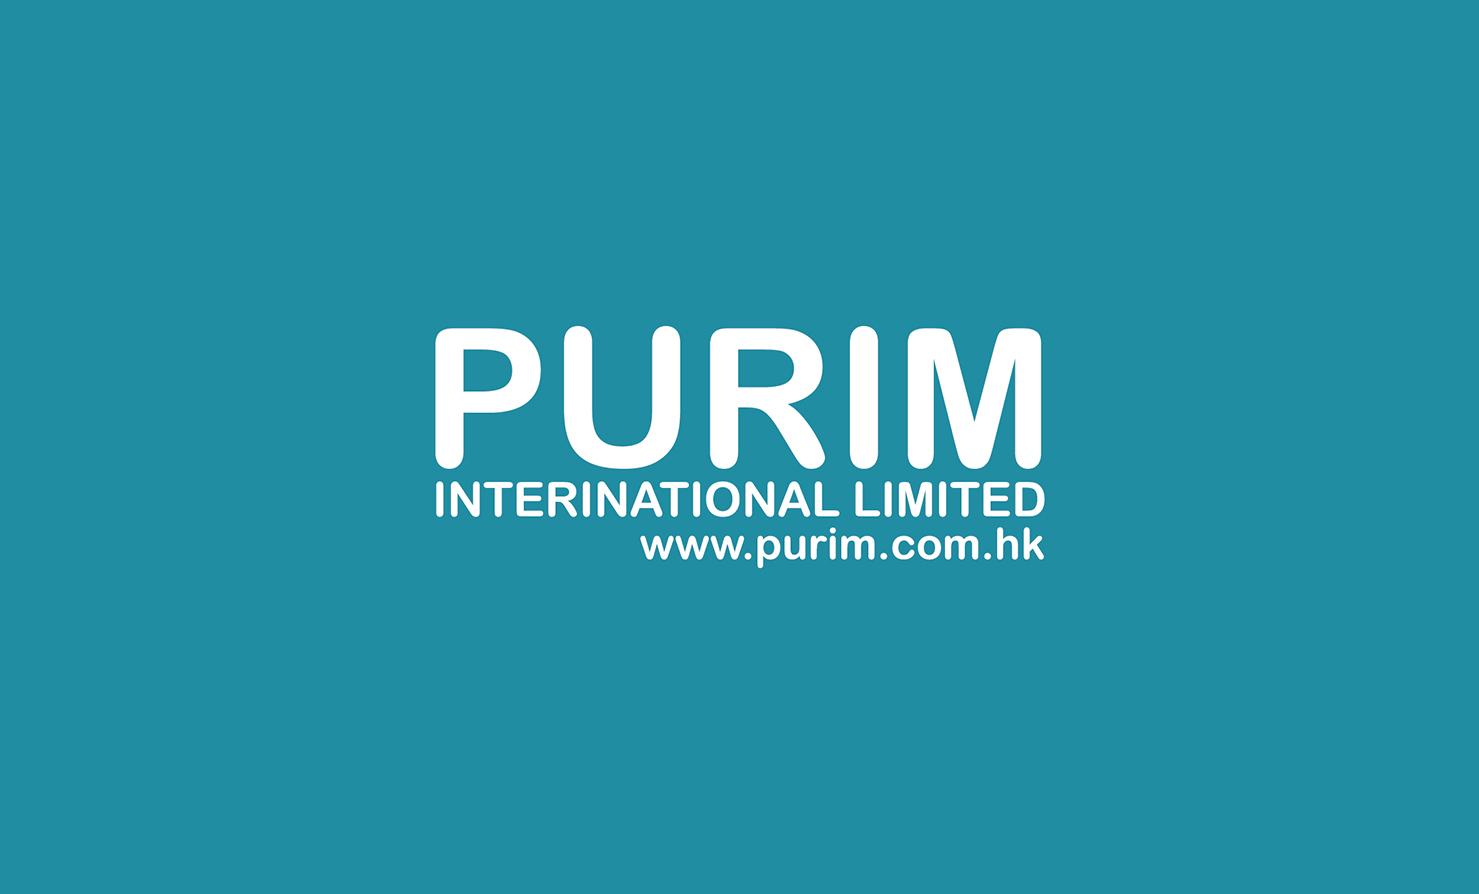 Purim Purim International Limited